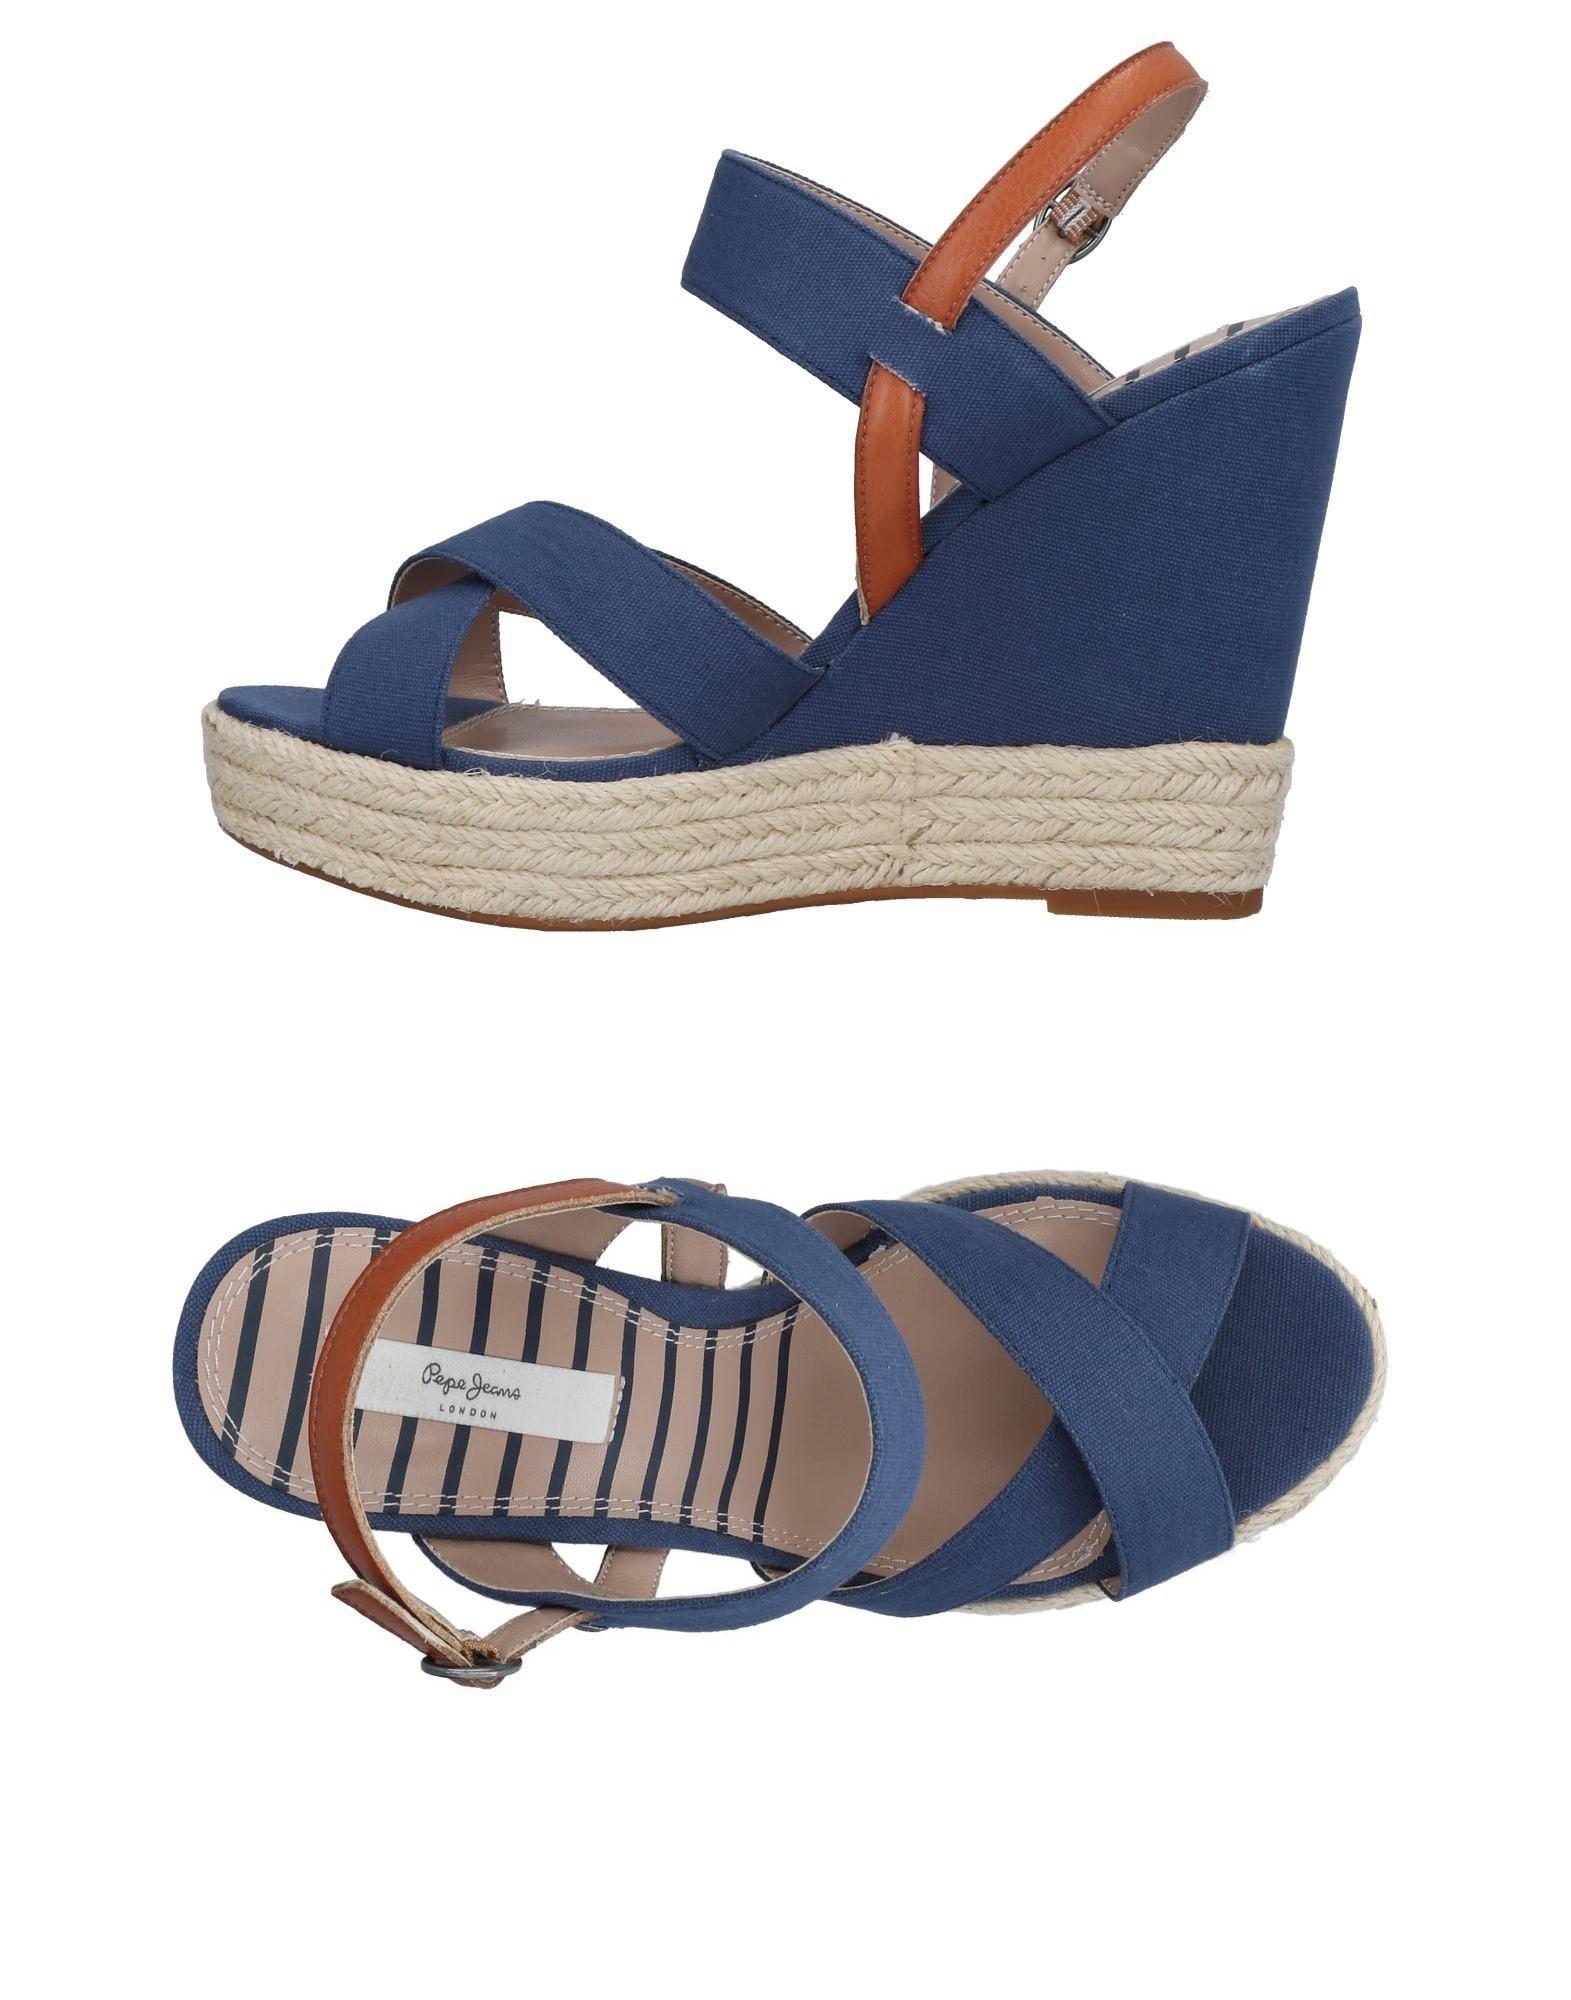 Sandales Pepe Jeans Femme - Sandales Pepe Jeans sur